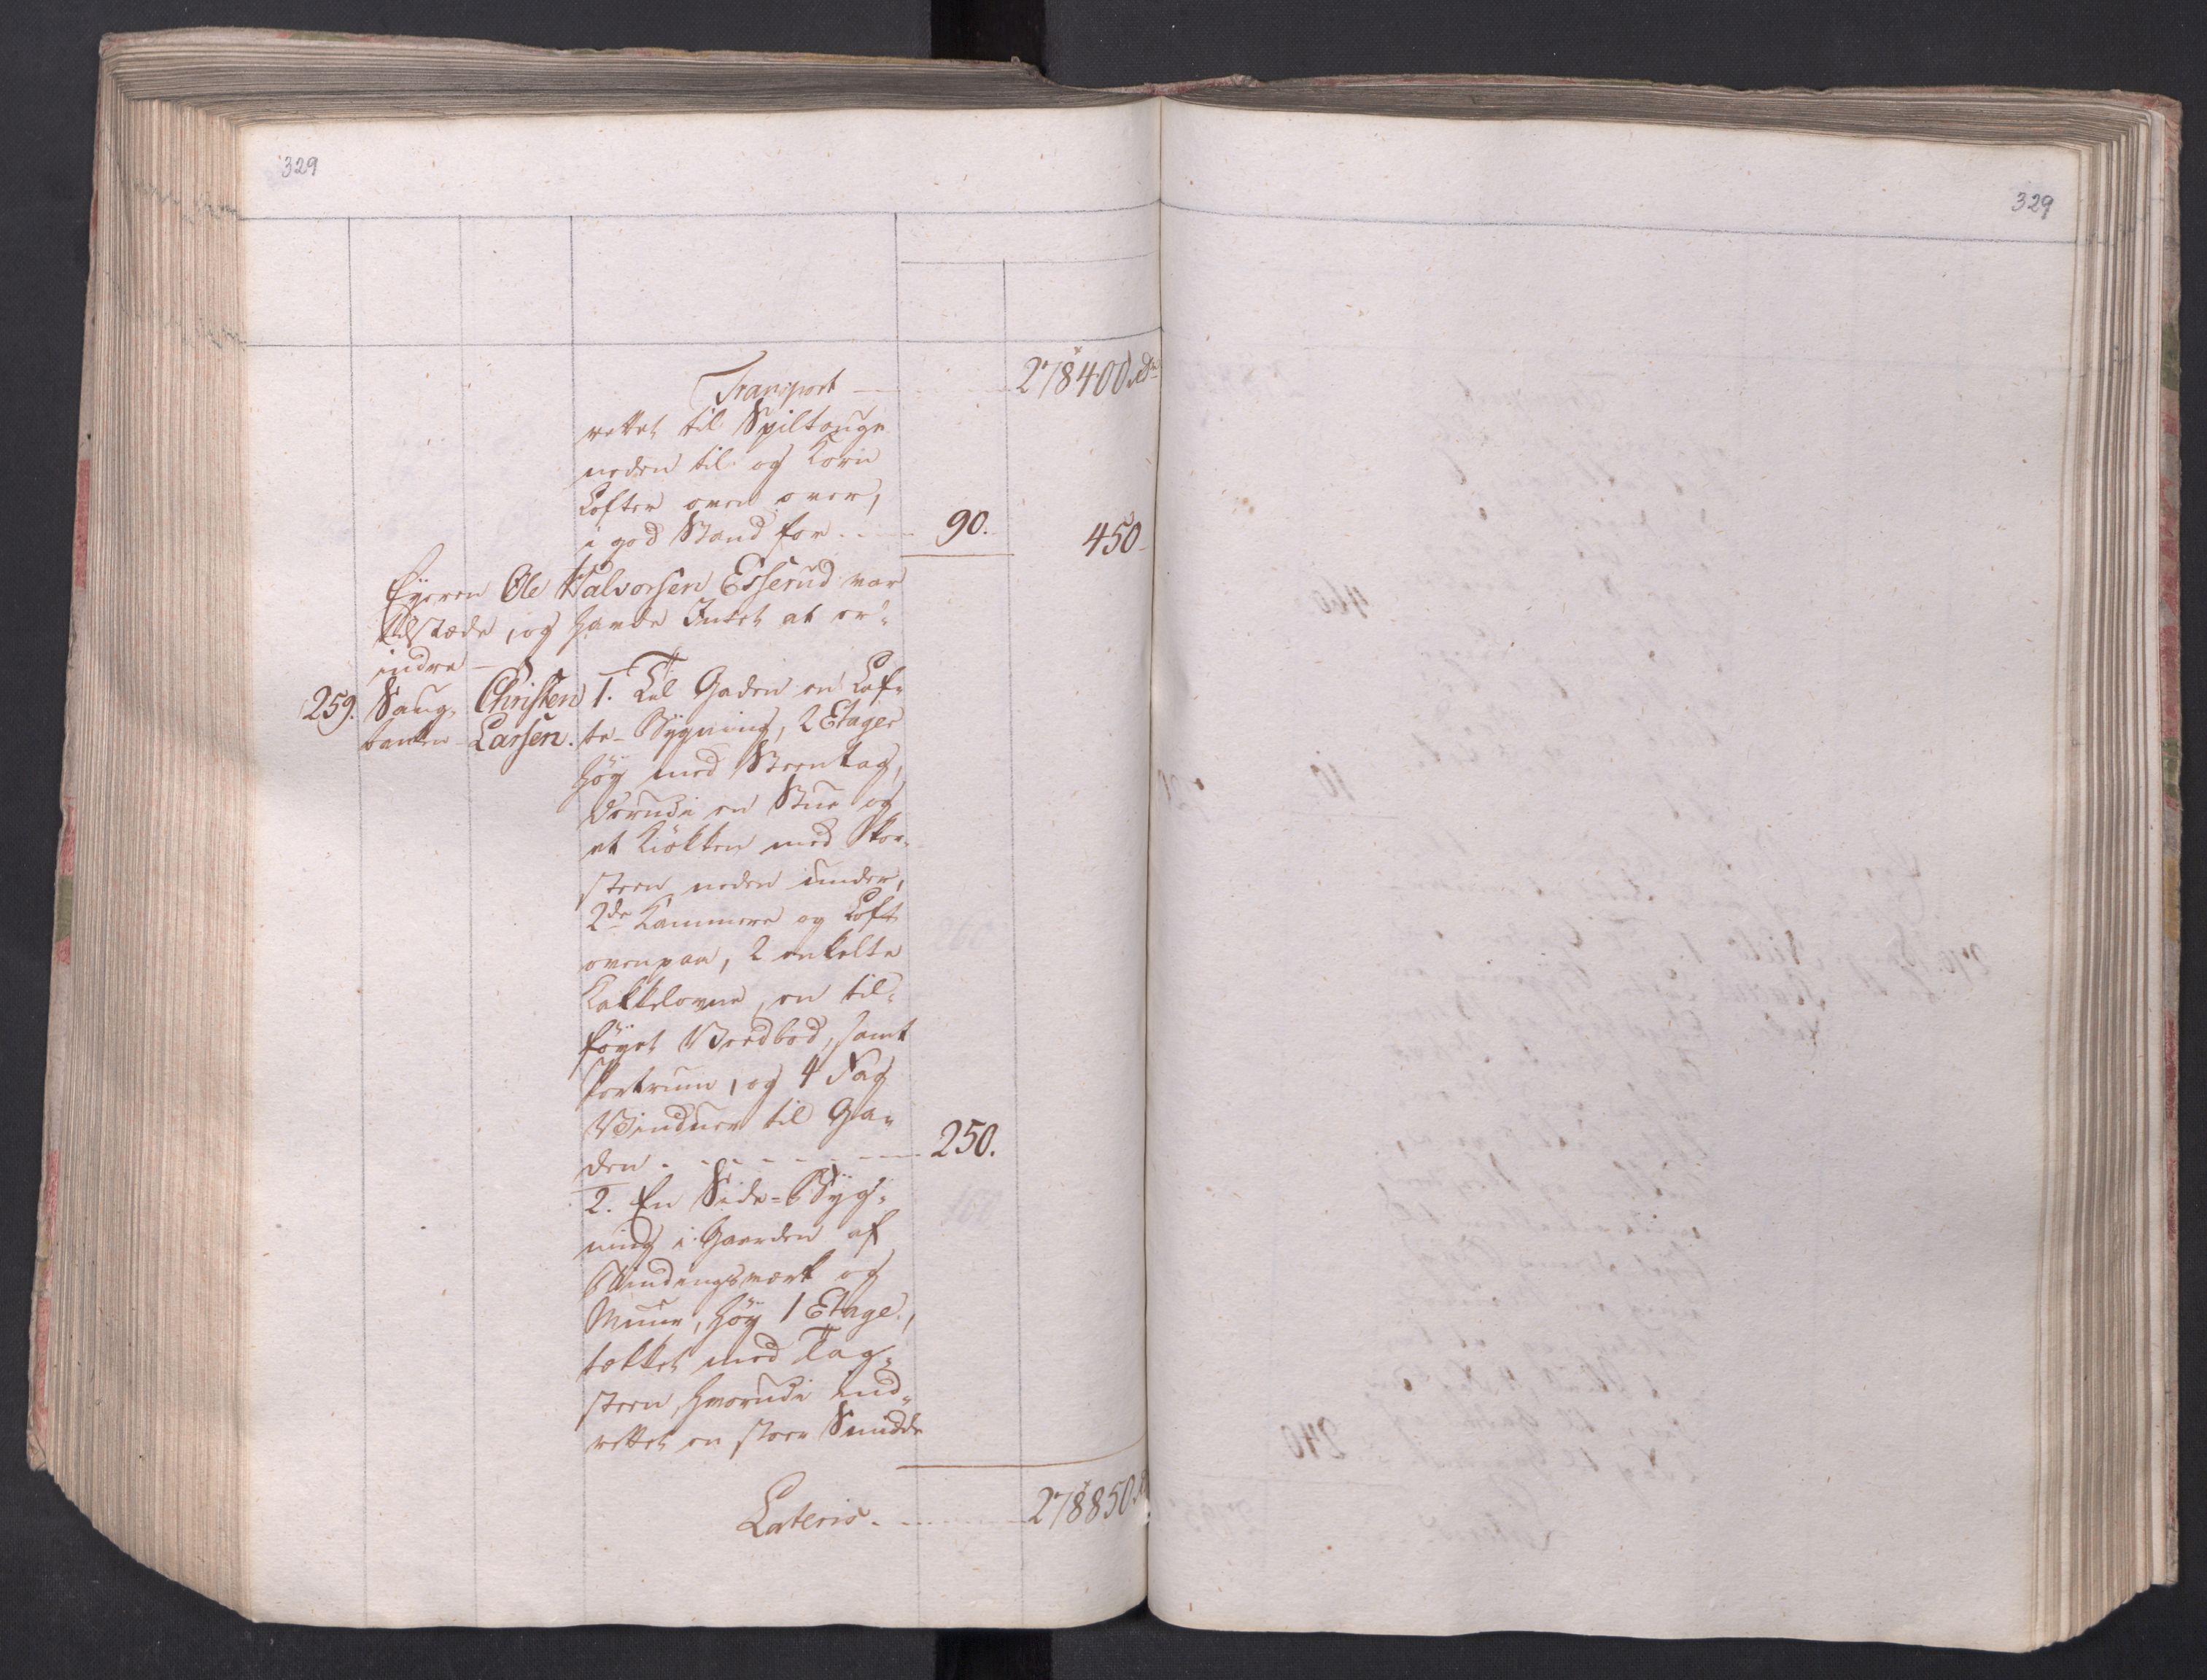 SAO, Kristiania stiftamt, I/Ia/L0015: Branntakster, 1797, s. 329